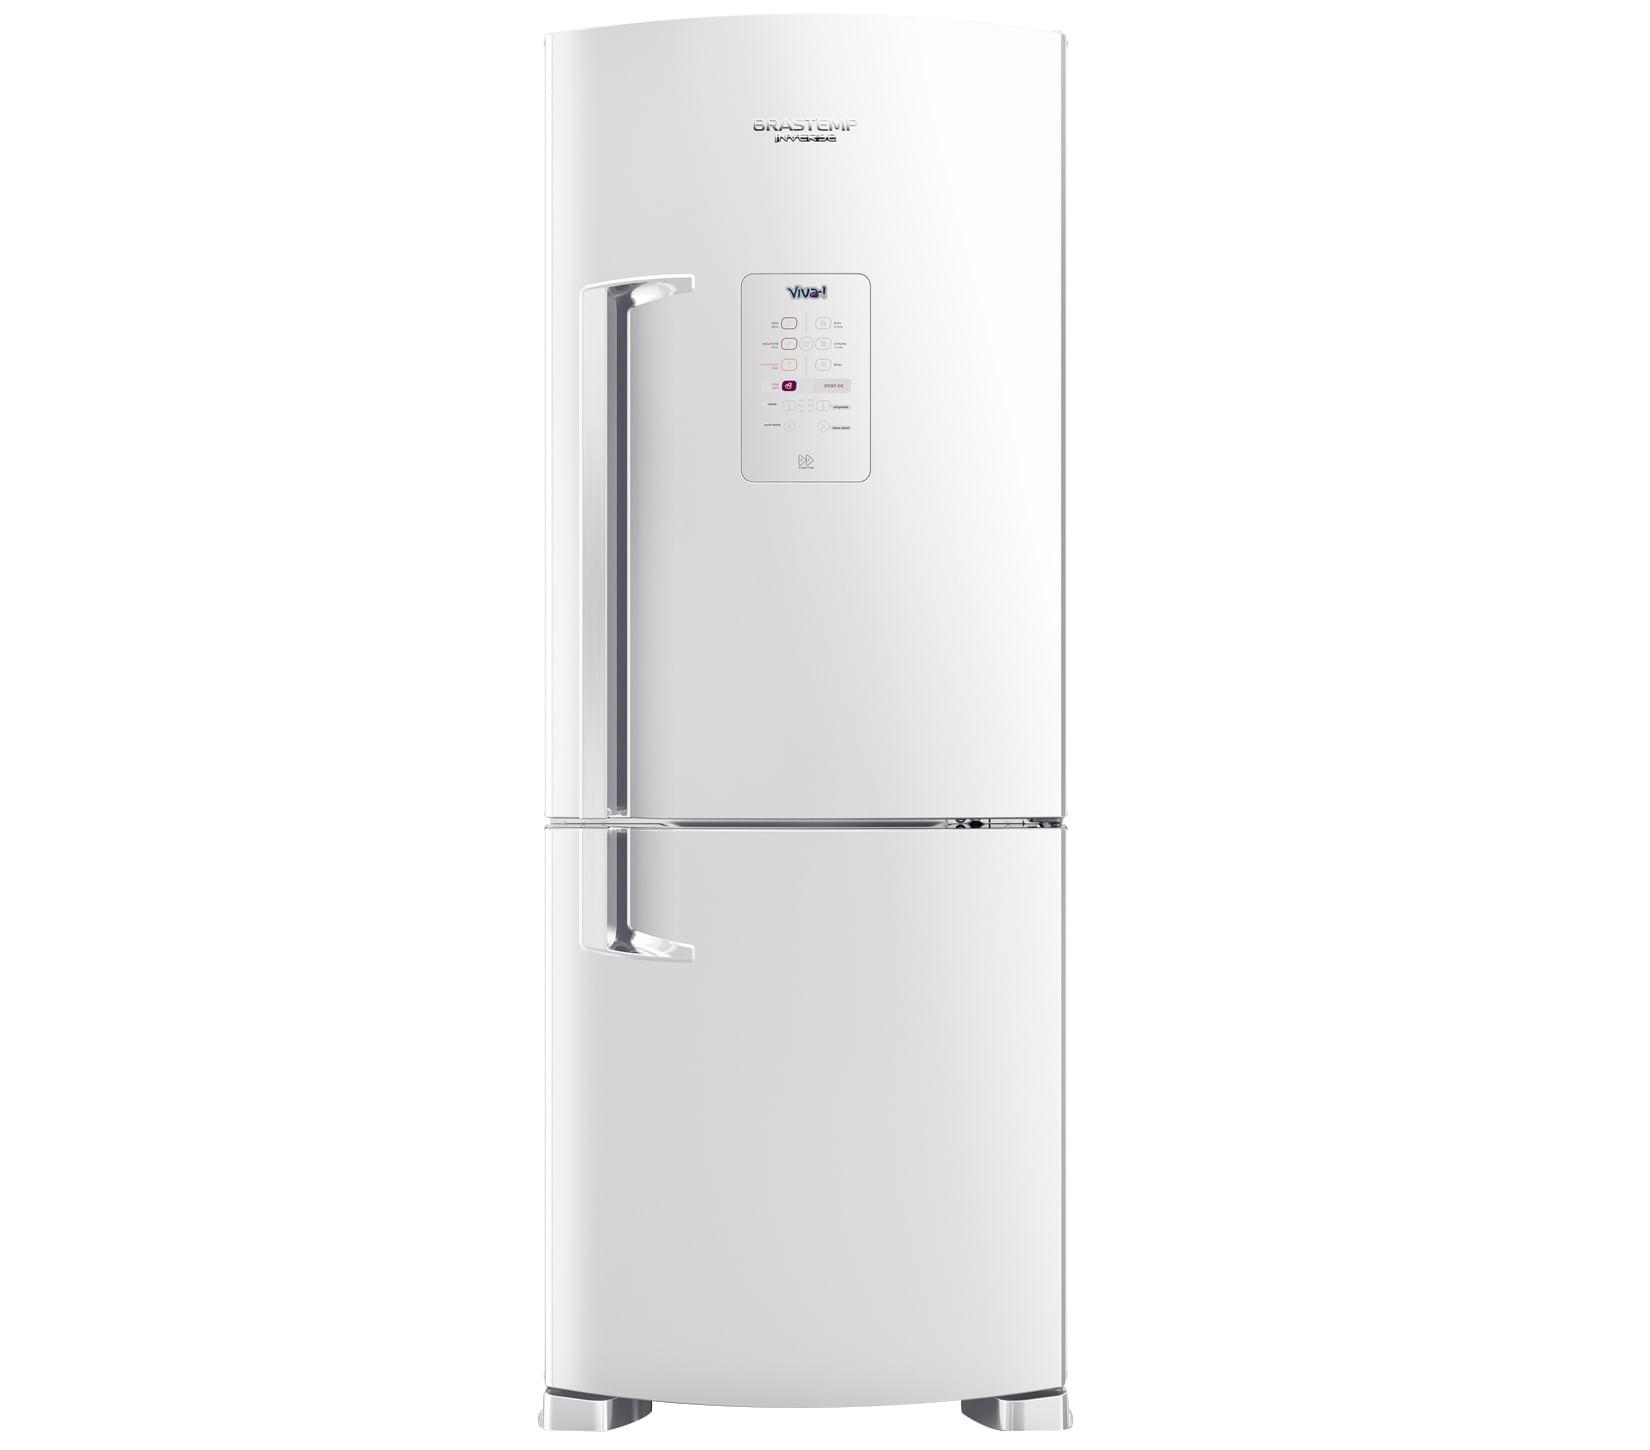 Geladeira Brastemp Frost Free Inverse 422 litros Branca Viva com Smart Ice